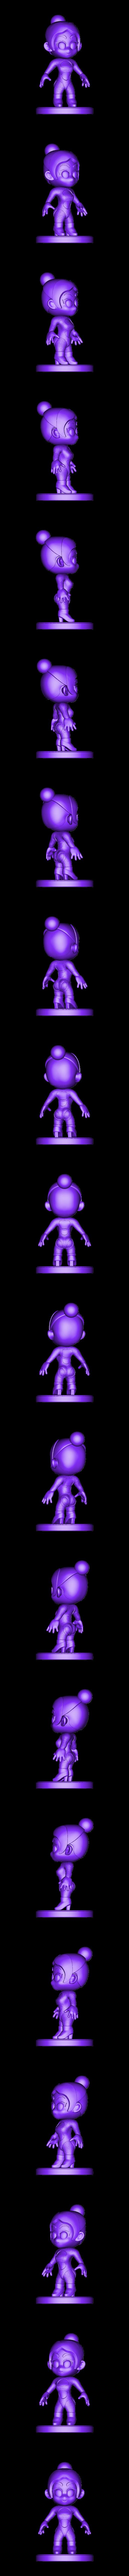 dua lipa21.stl Descargar archivo STL DUA LIPA // CHIBI ( Mtv Ema 2019 ) • Diseño para impresión en 3D, MatteoMoscatelli